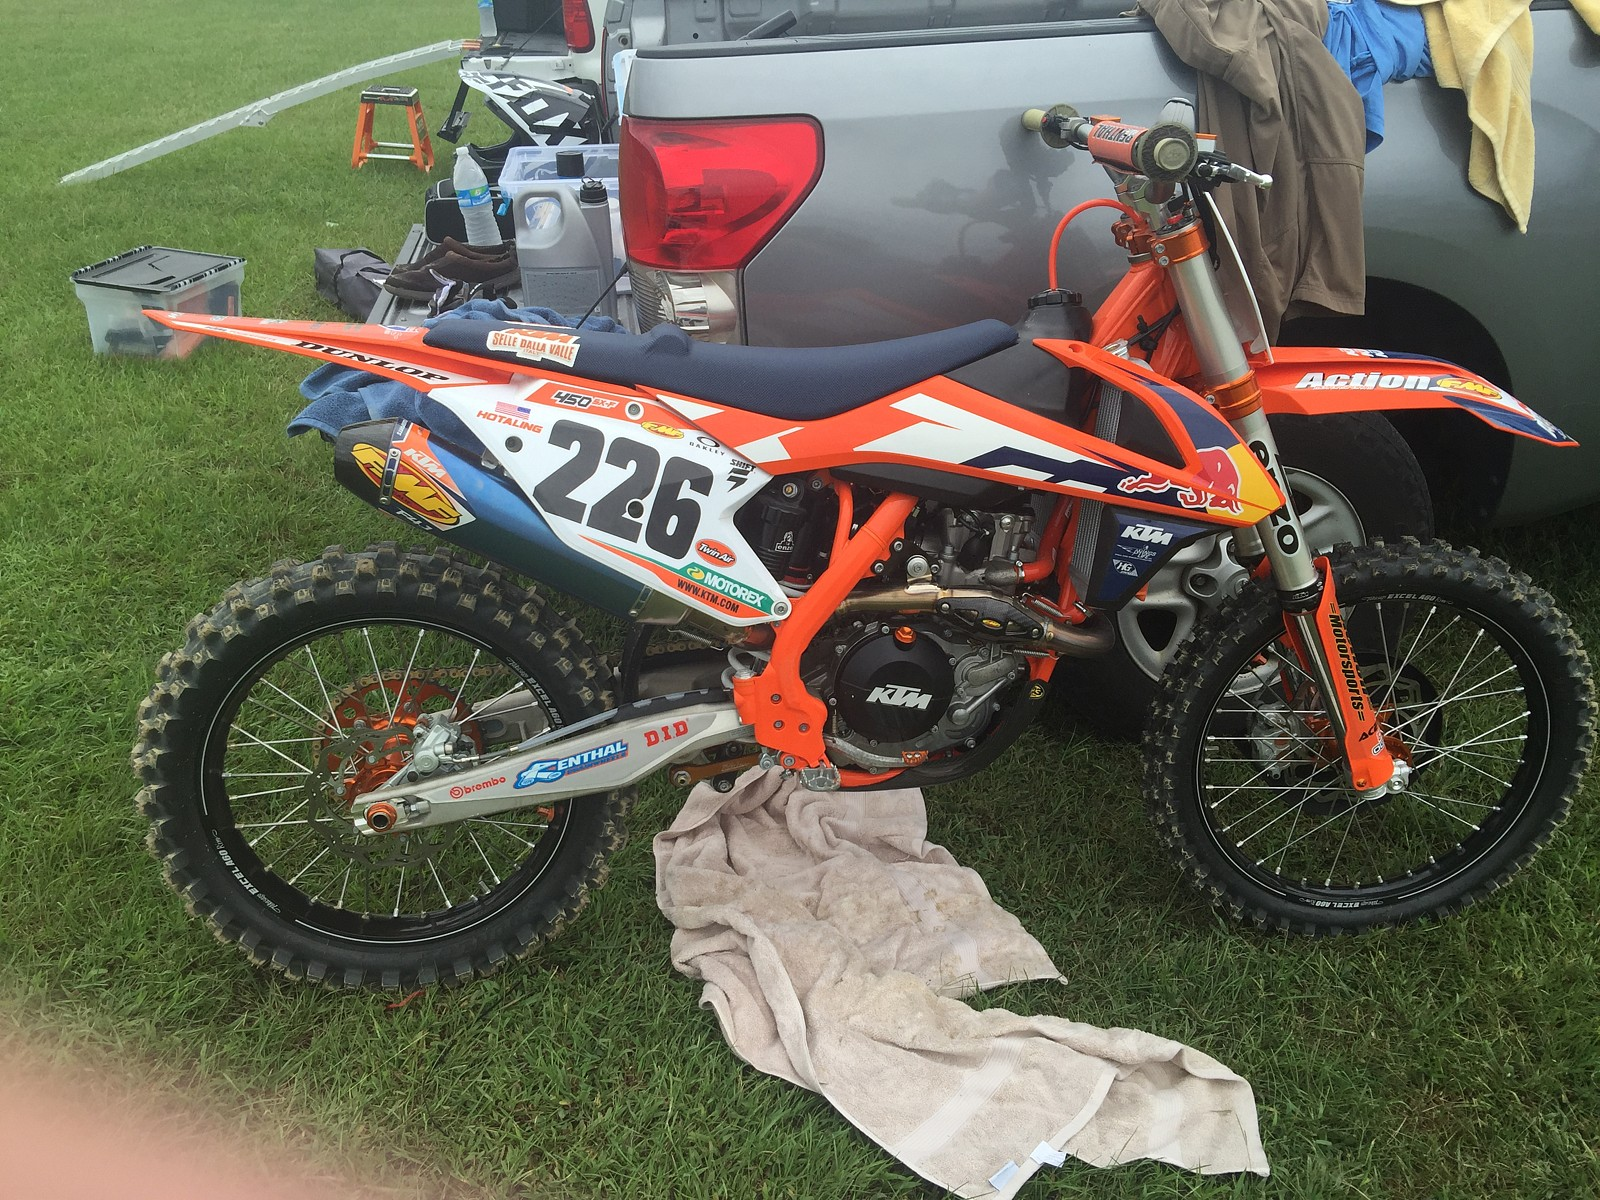 F4654523-B01C-4ADE-B045-16E3E123D459 - Paul333 - Motocross Pictures - Vital MX